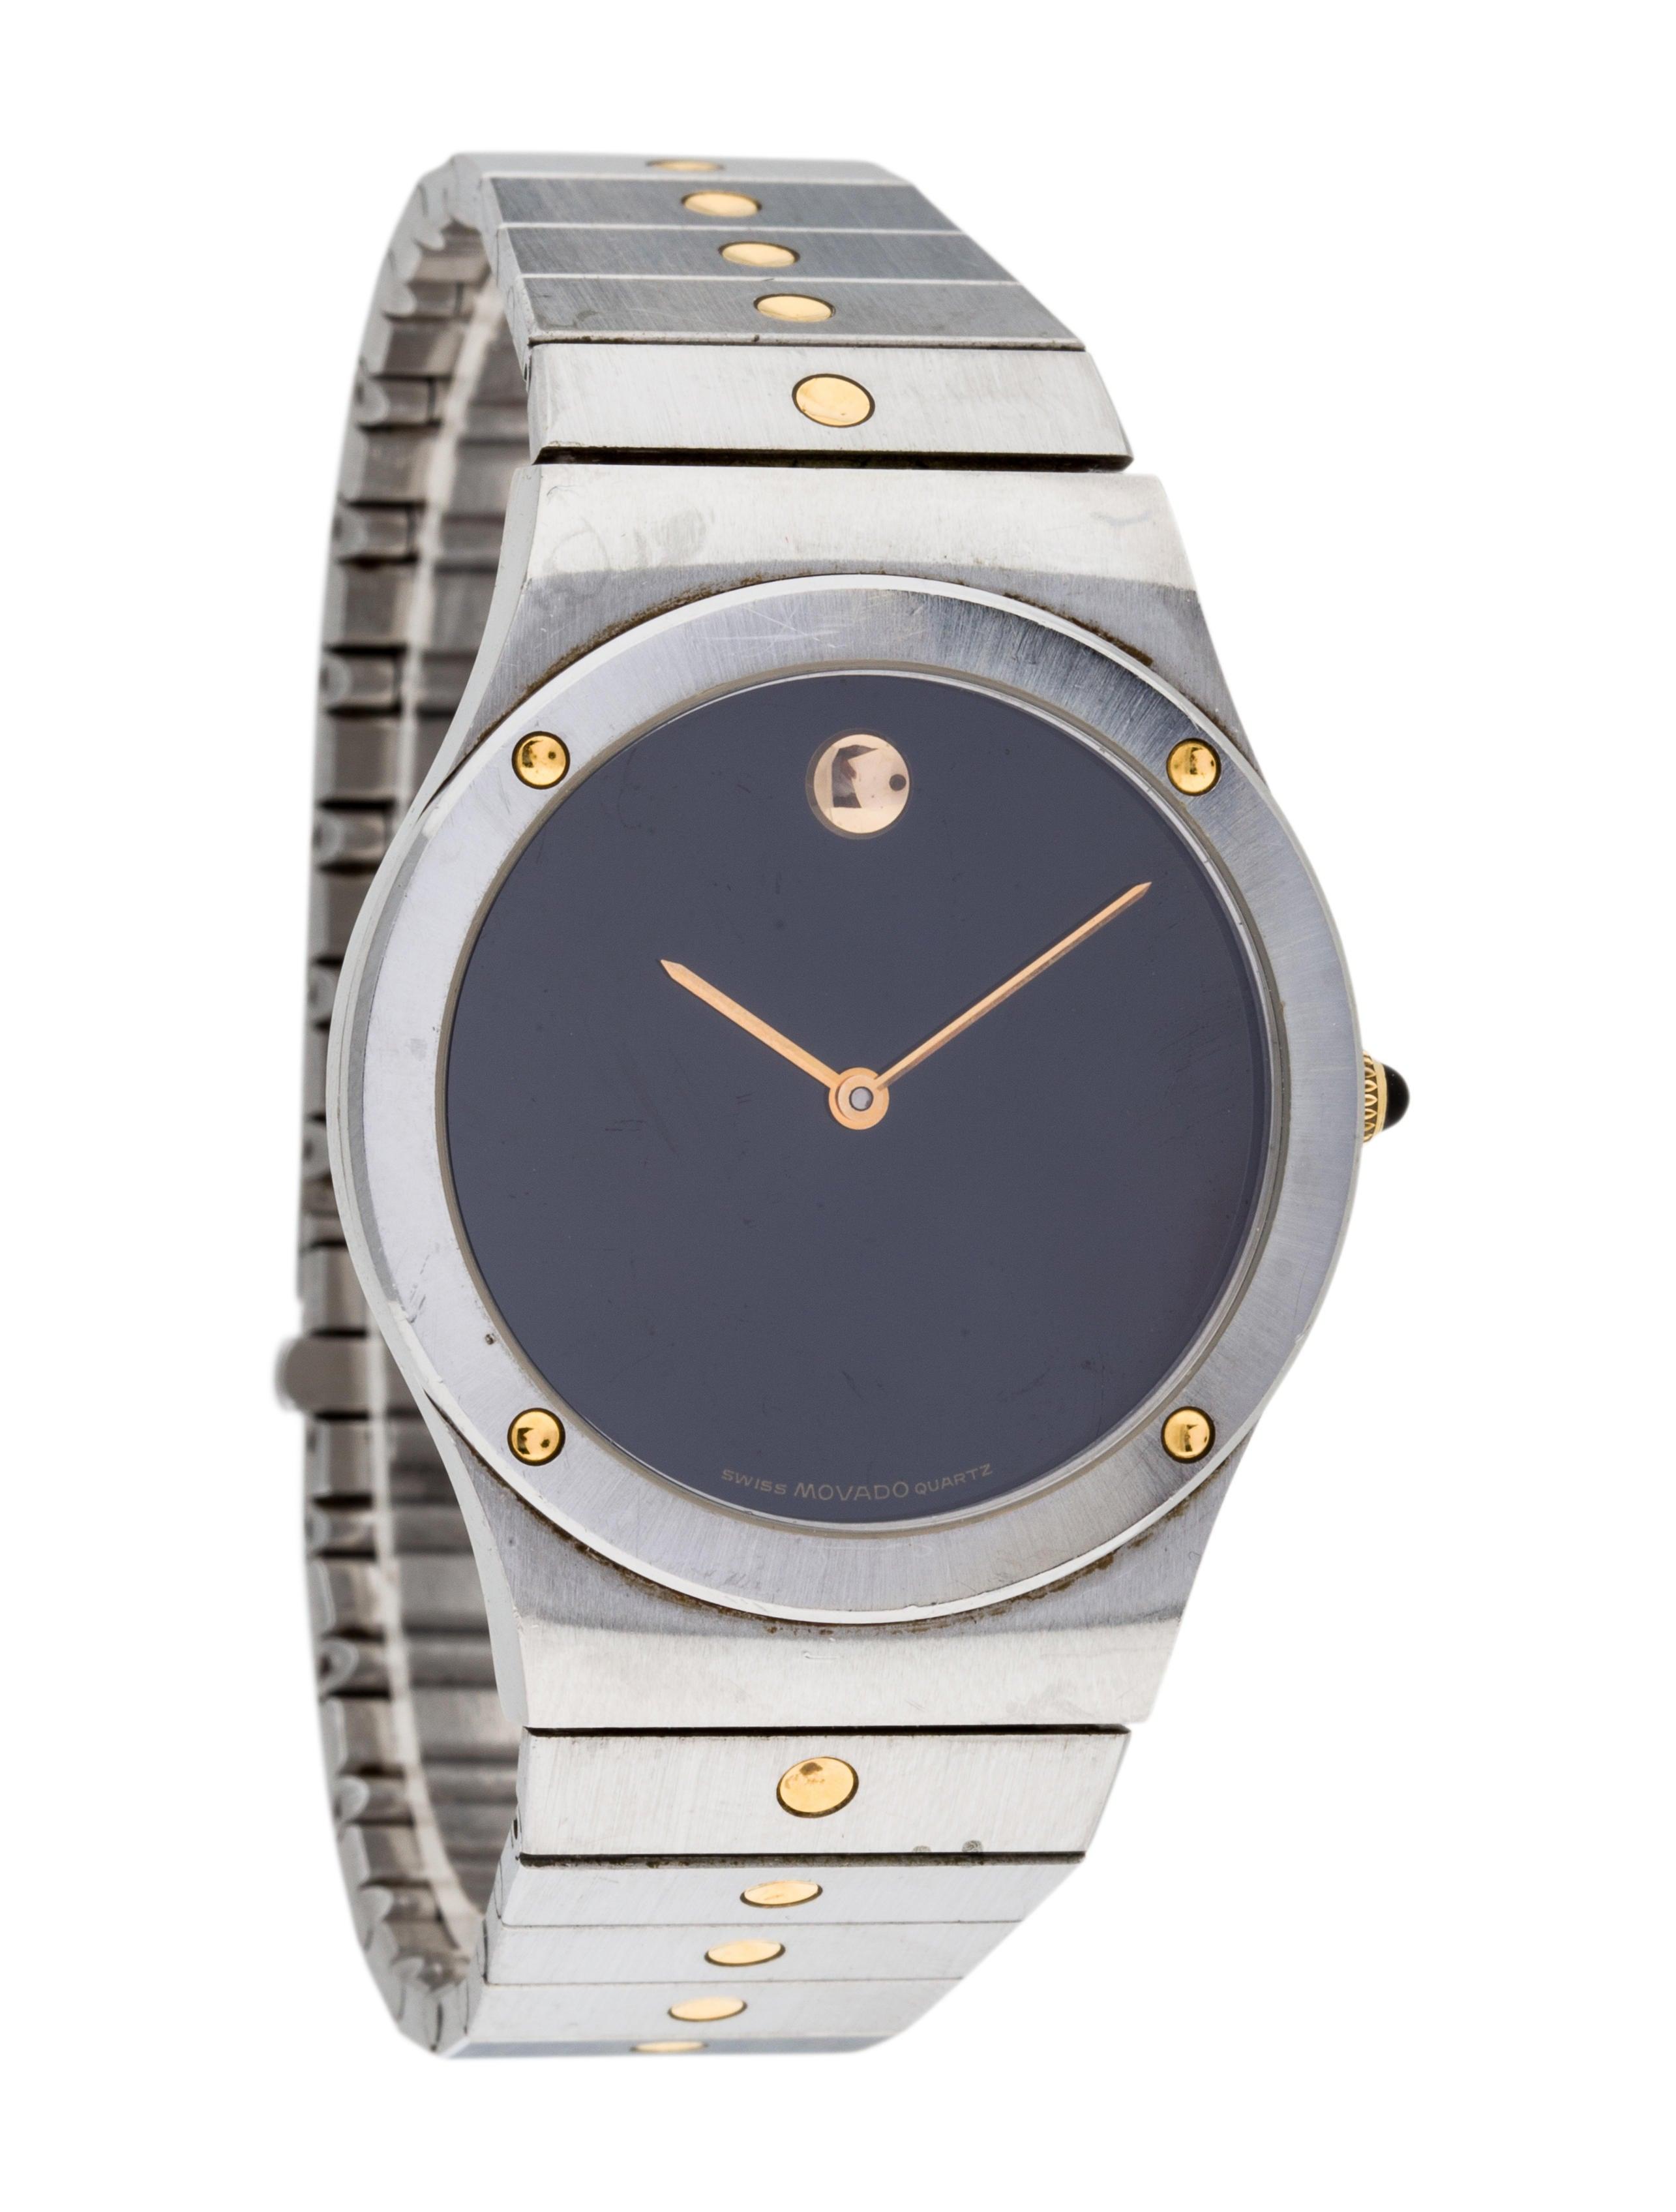 Movado Museum Classic Watch Bracelet Mov20299 The